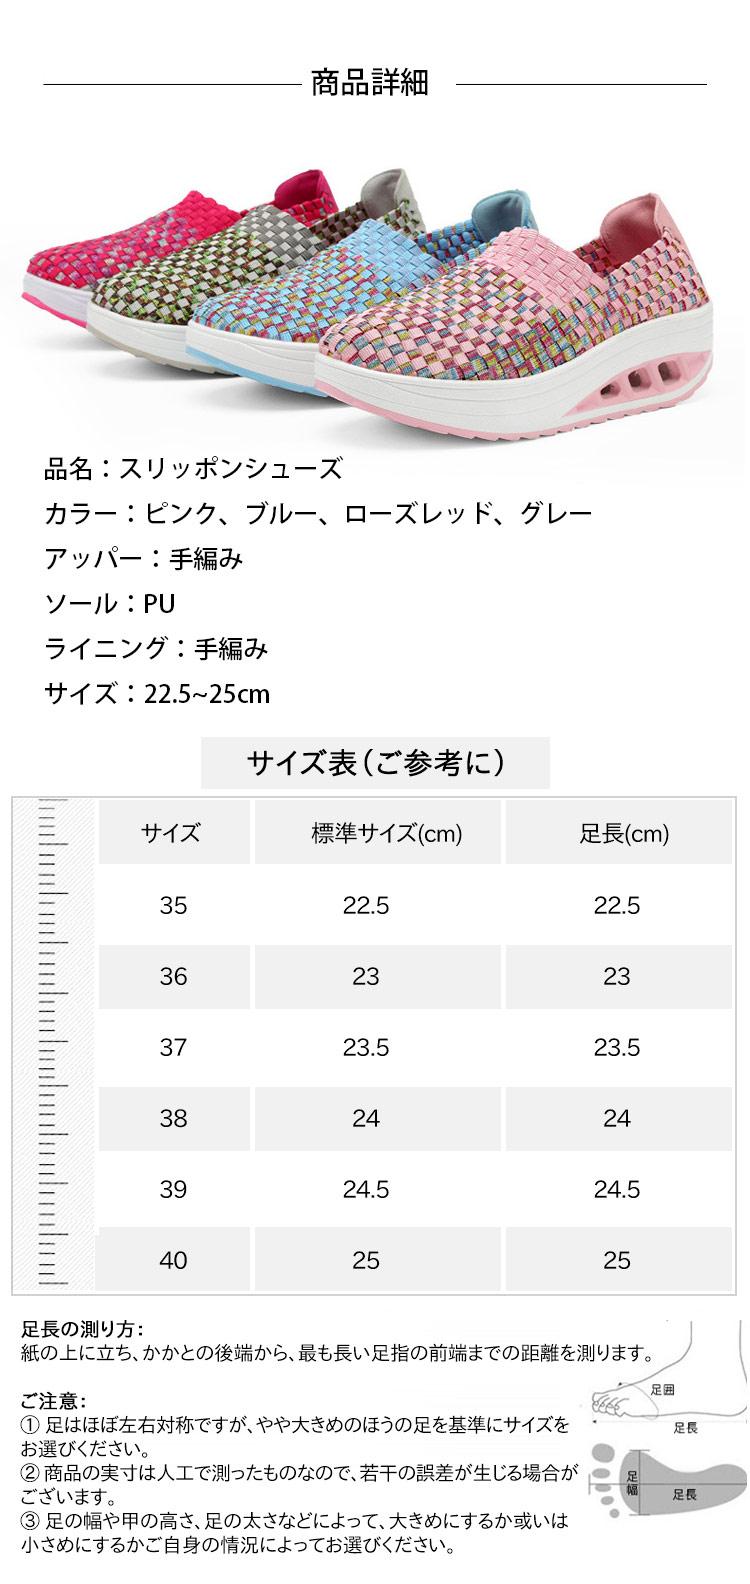 index_31.jpg